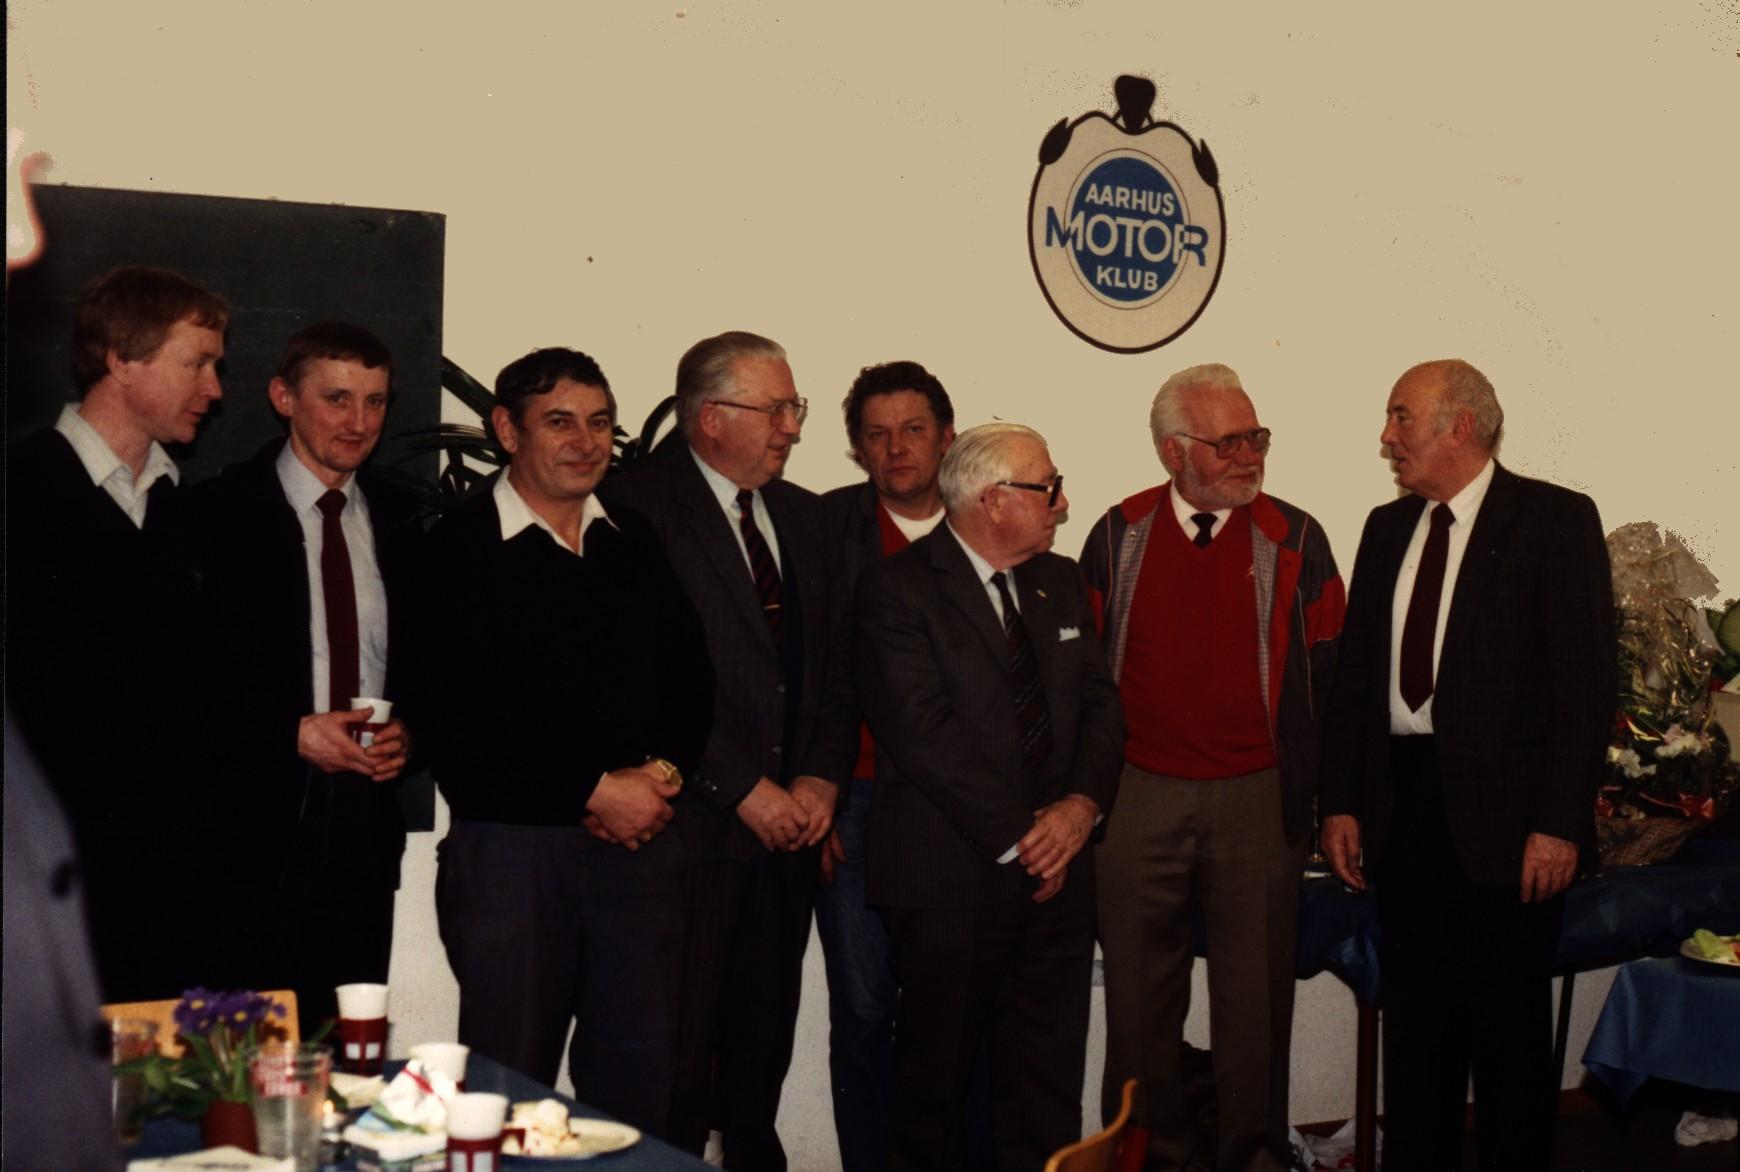 Klubbens 60 års jubilæum på Søsporten i 1990, Carlo nr. 2 fra højre.